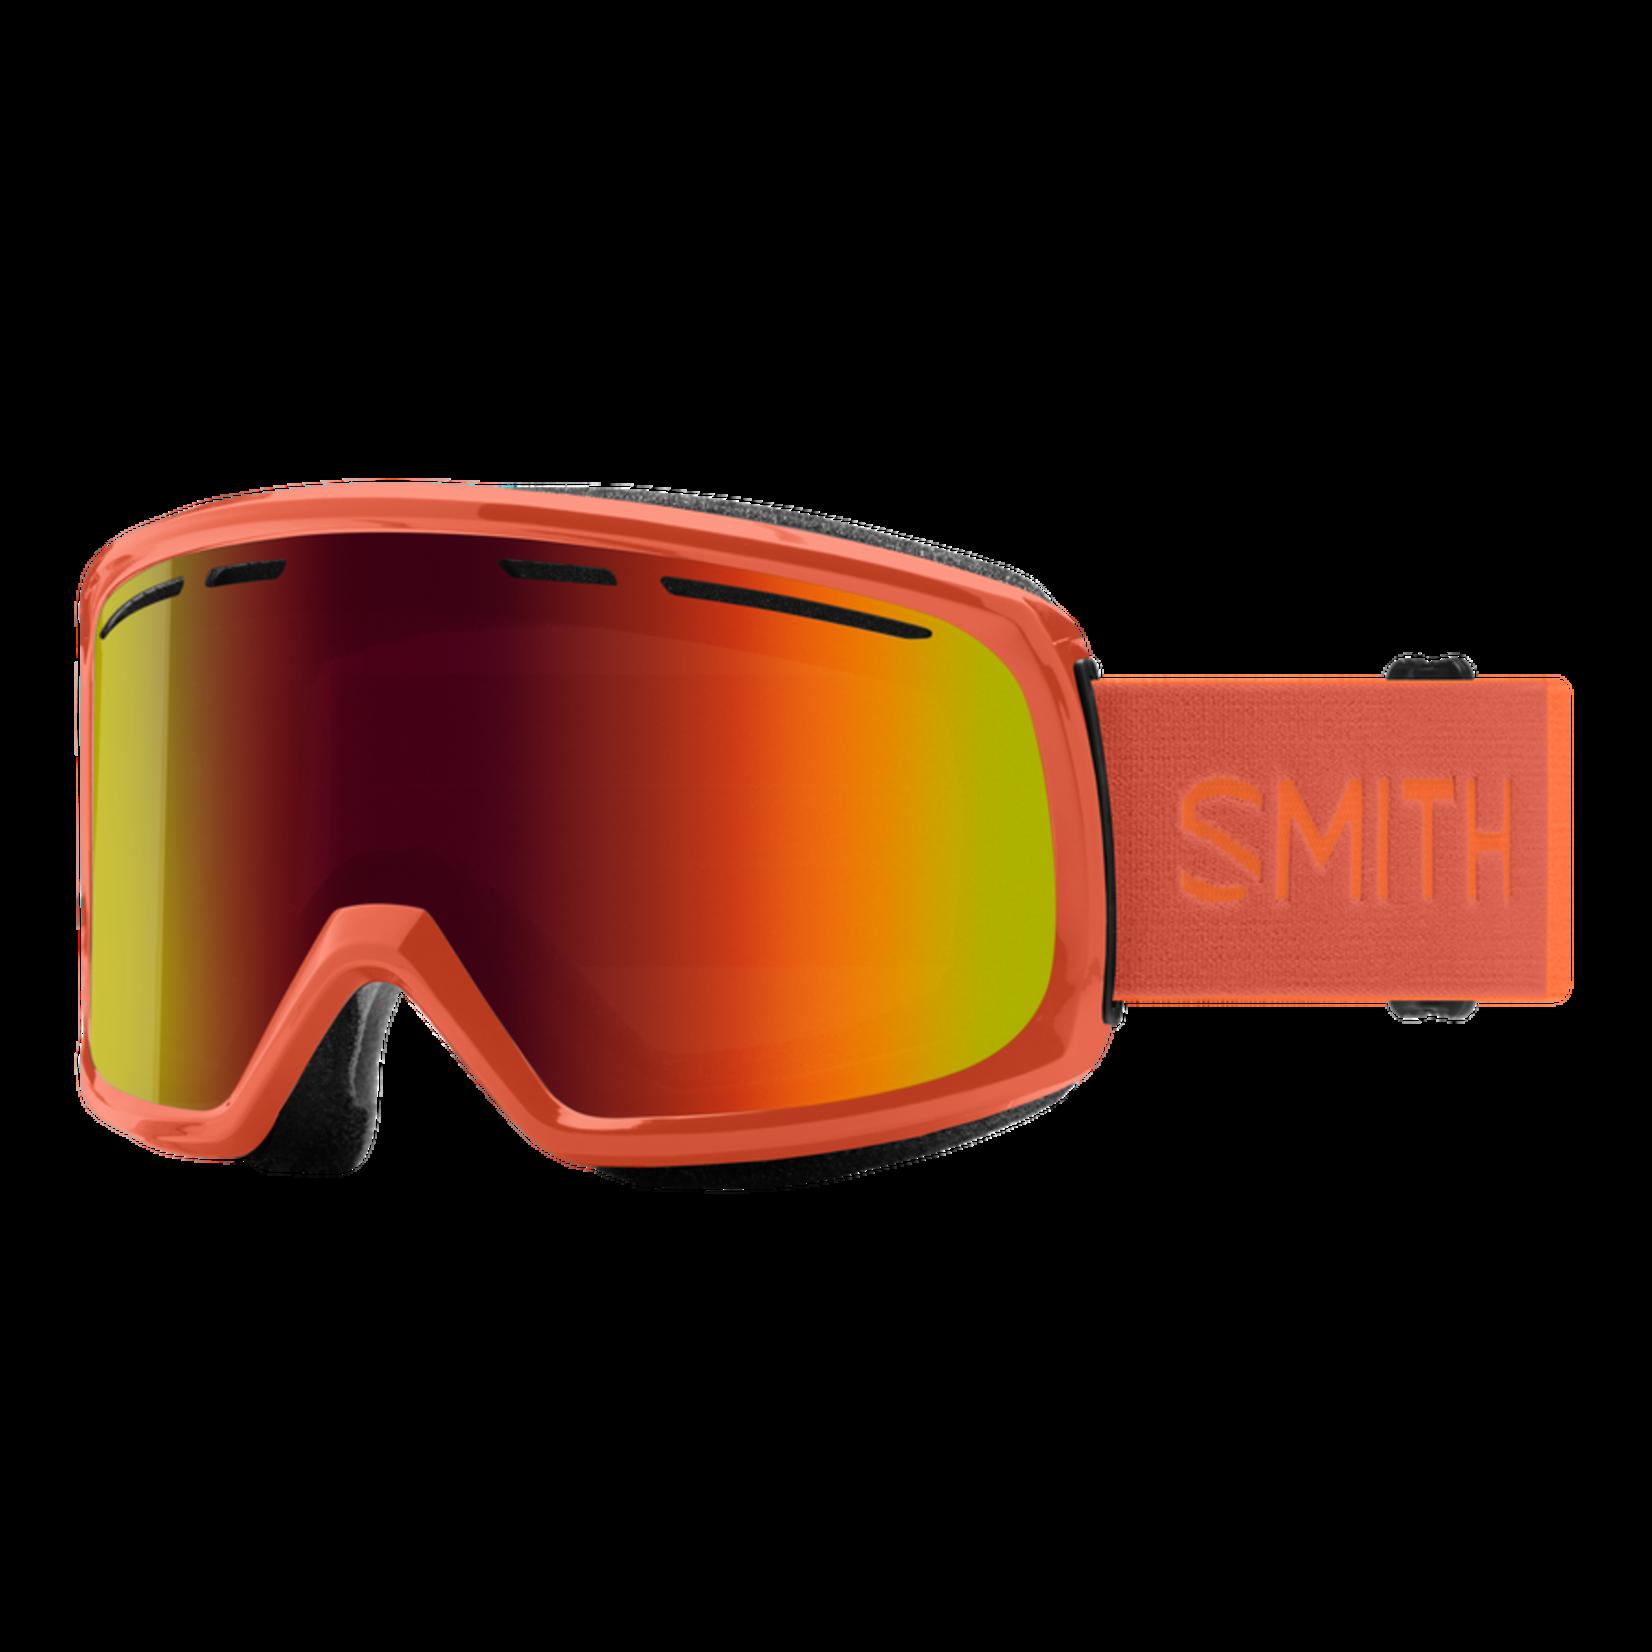 Smith Smith  Range Goggles